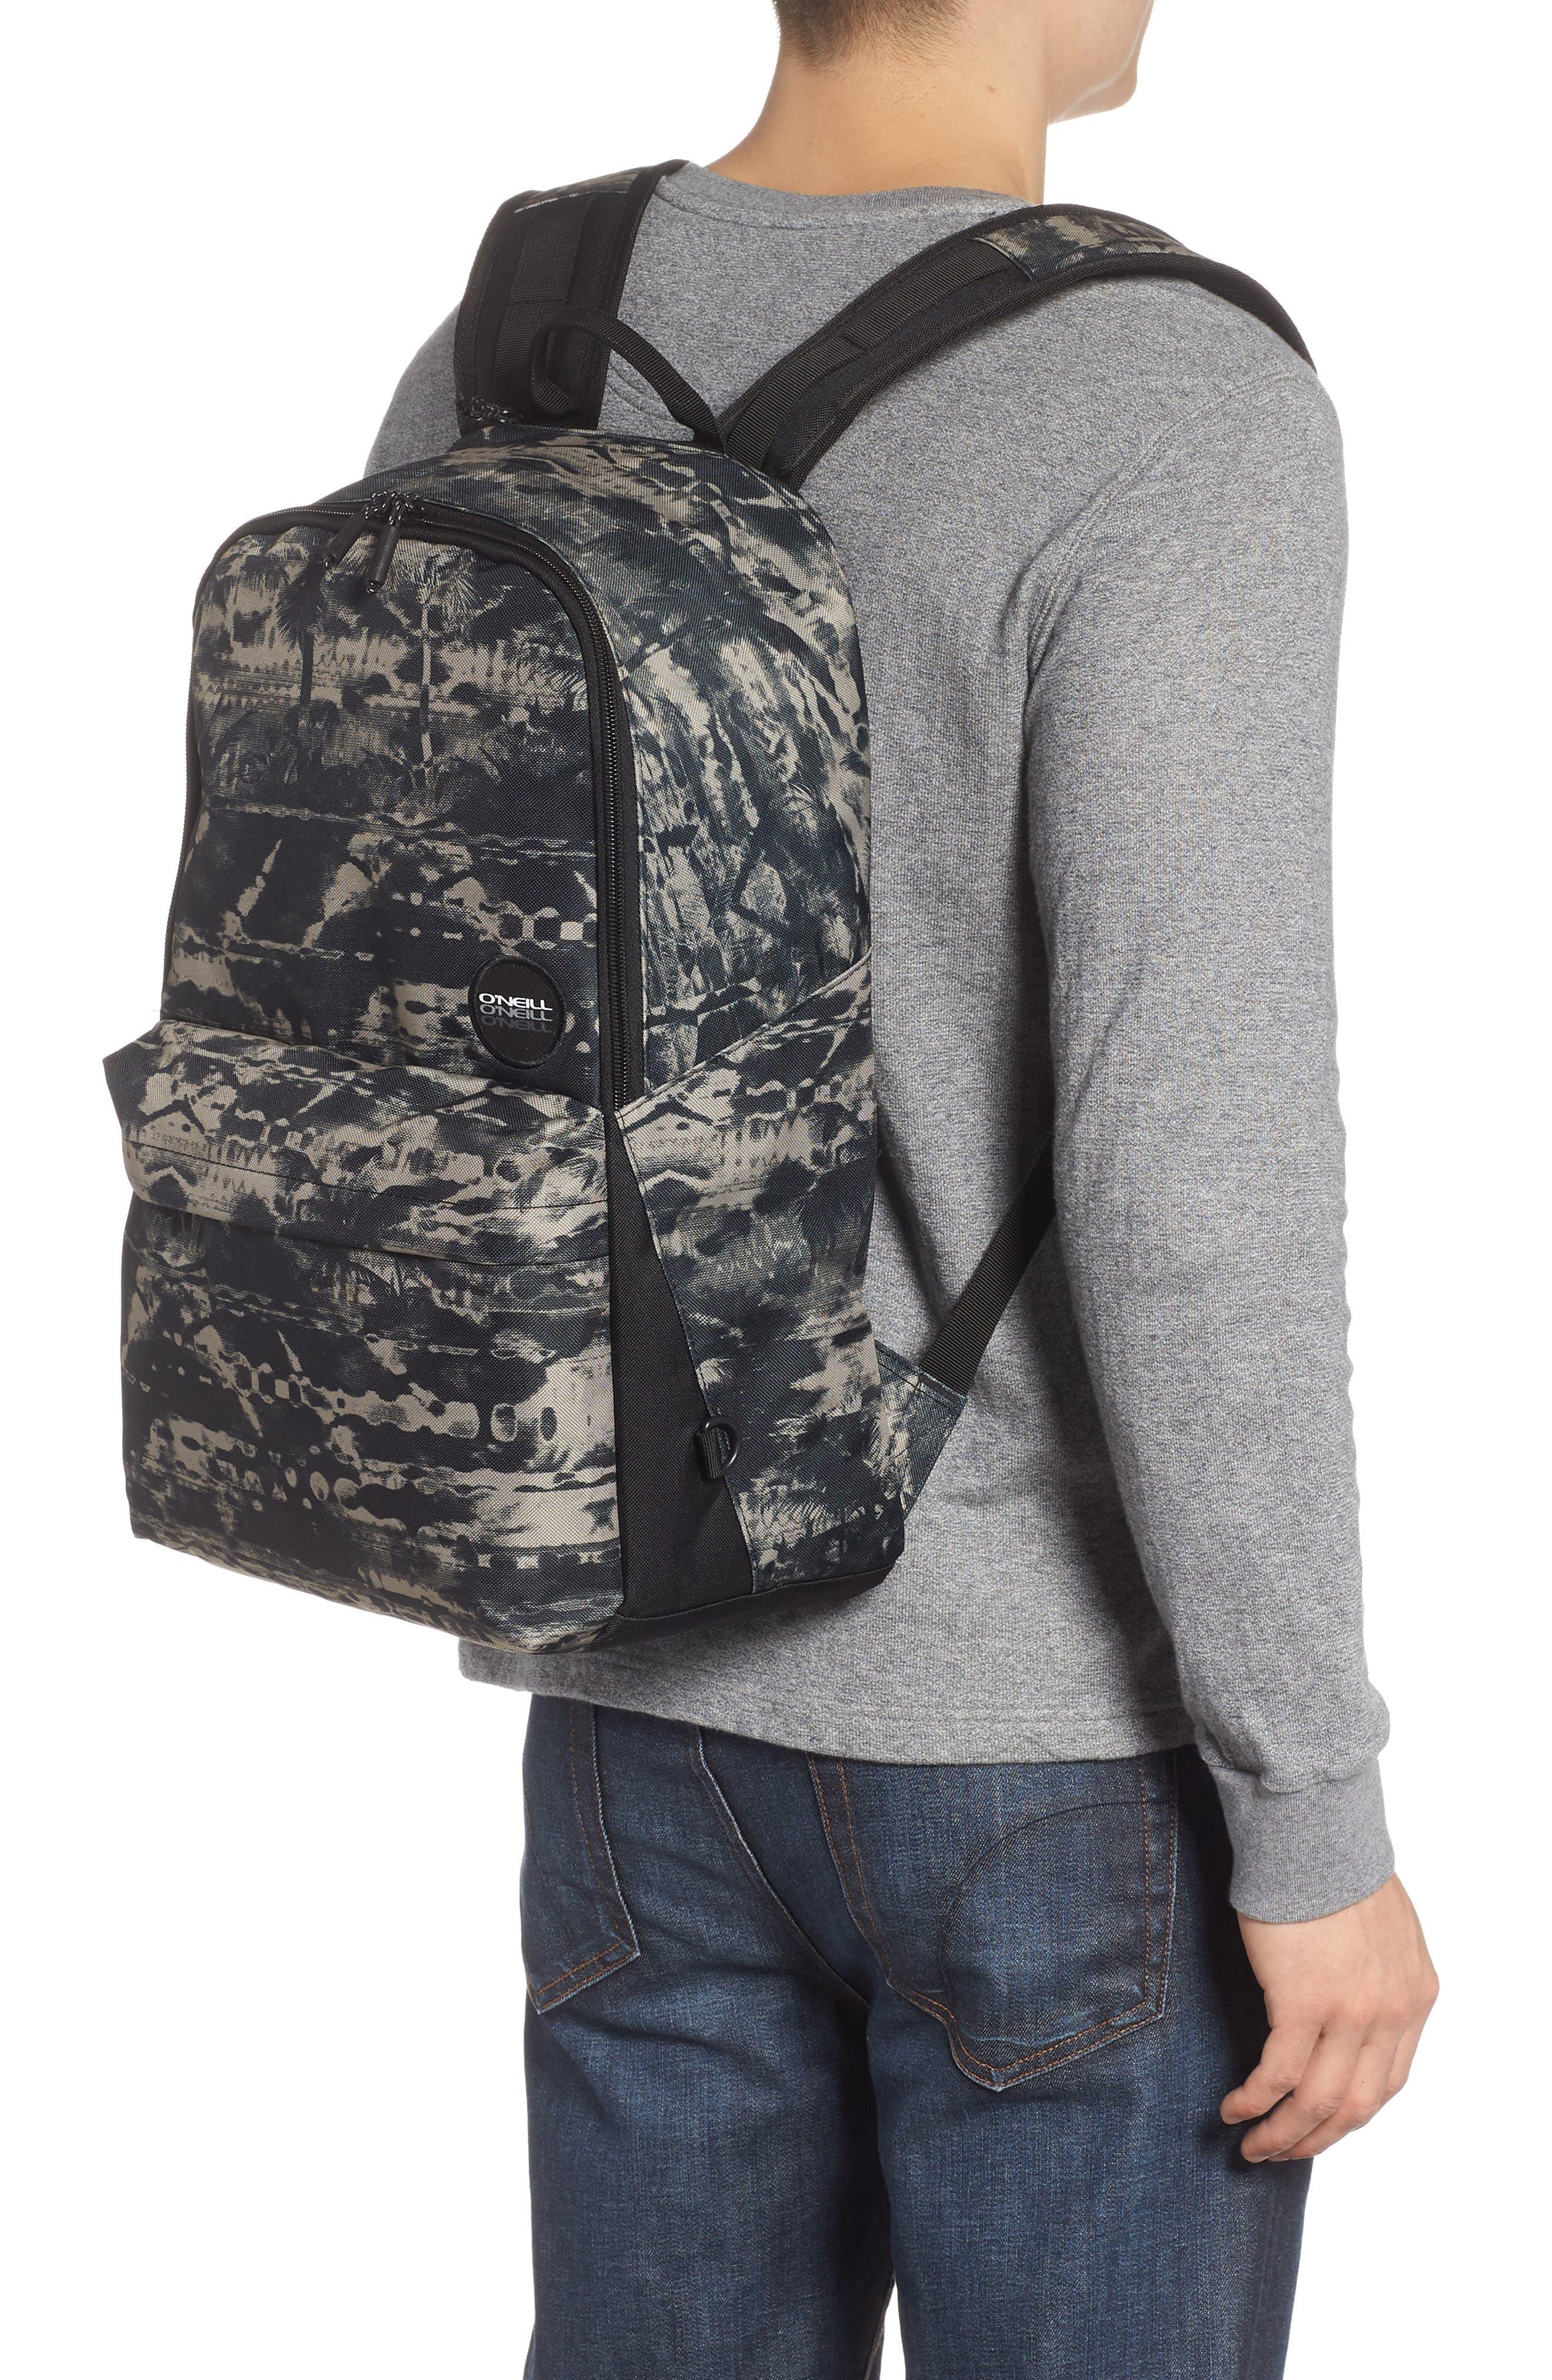 Transfer Backpack,                             Alternate thumbnail 2, color,                             DARK ARMY